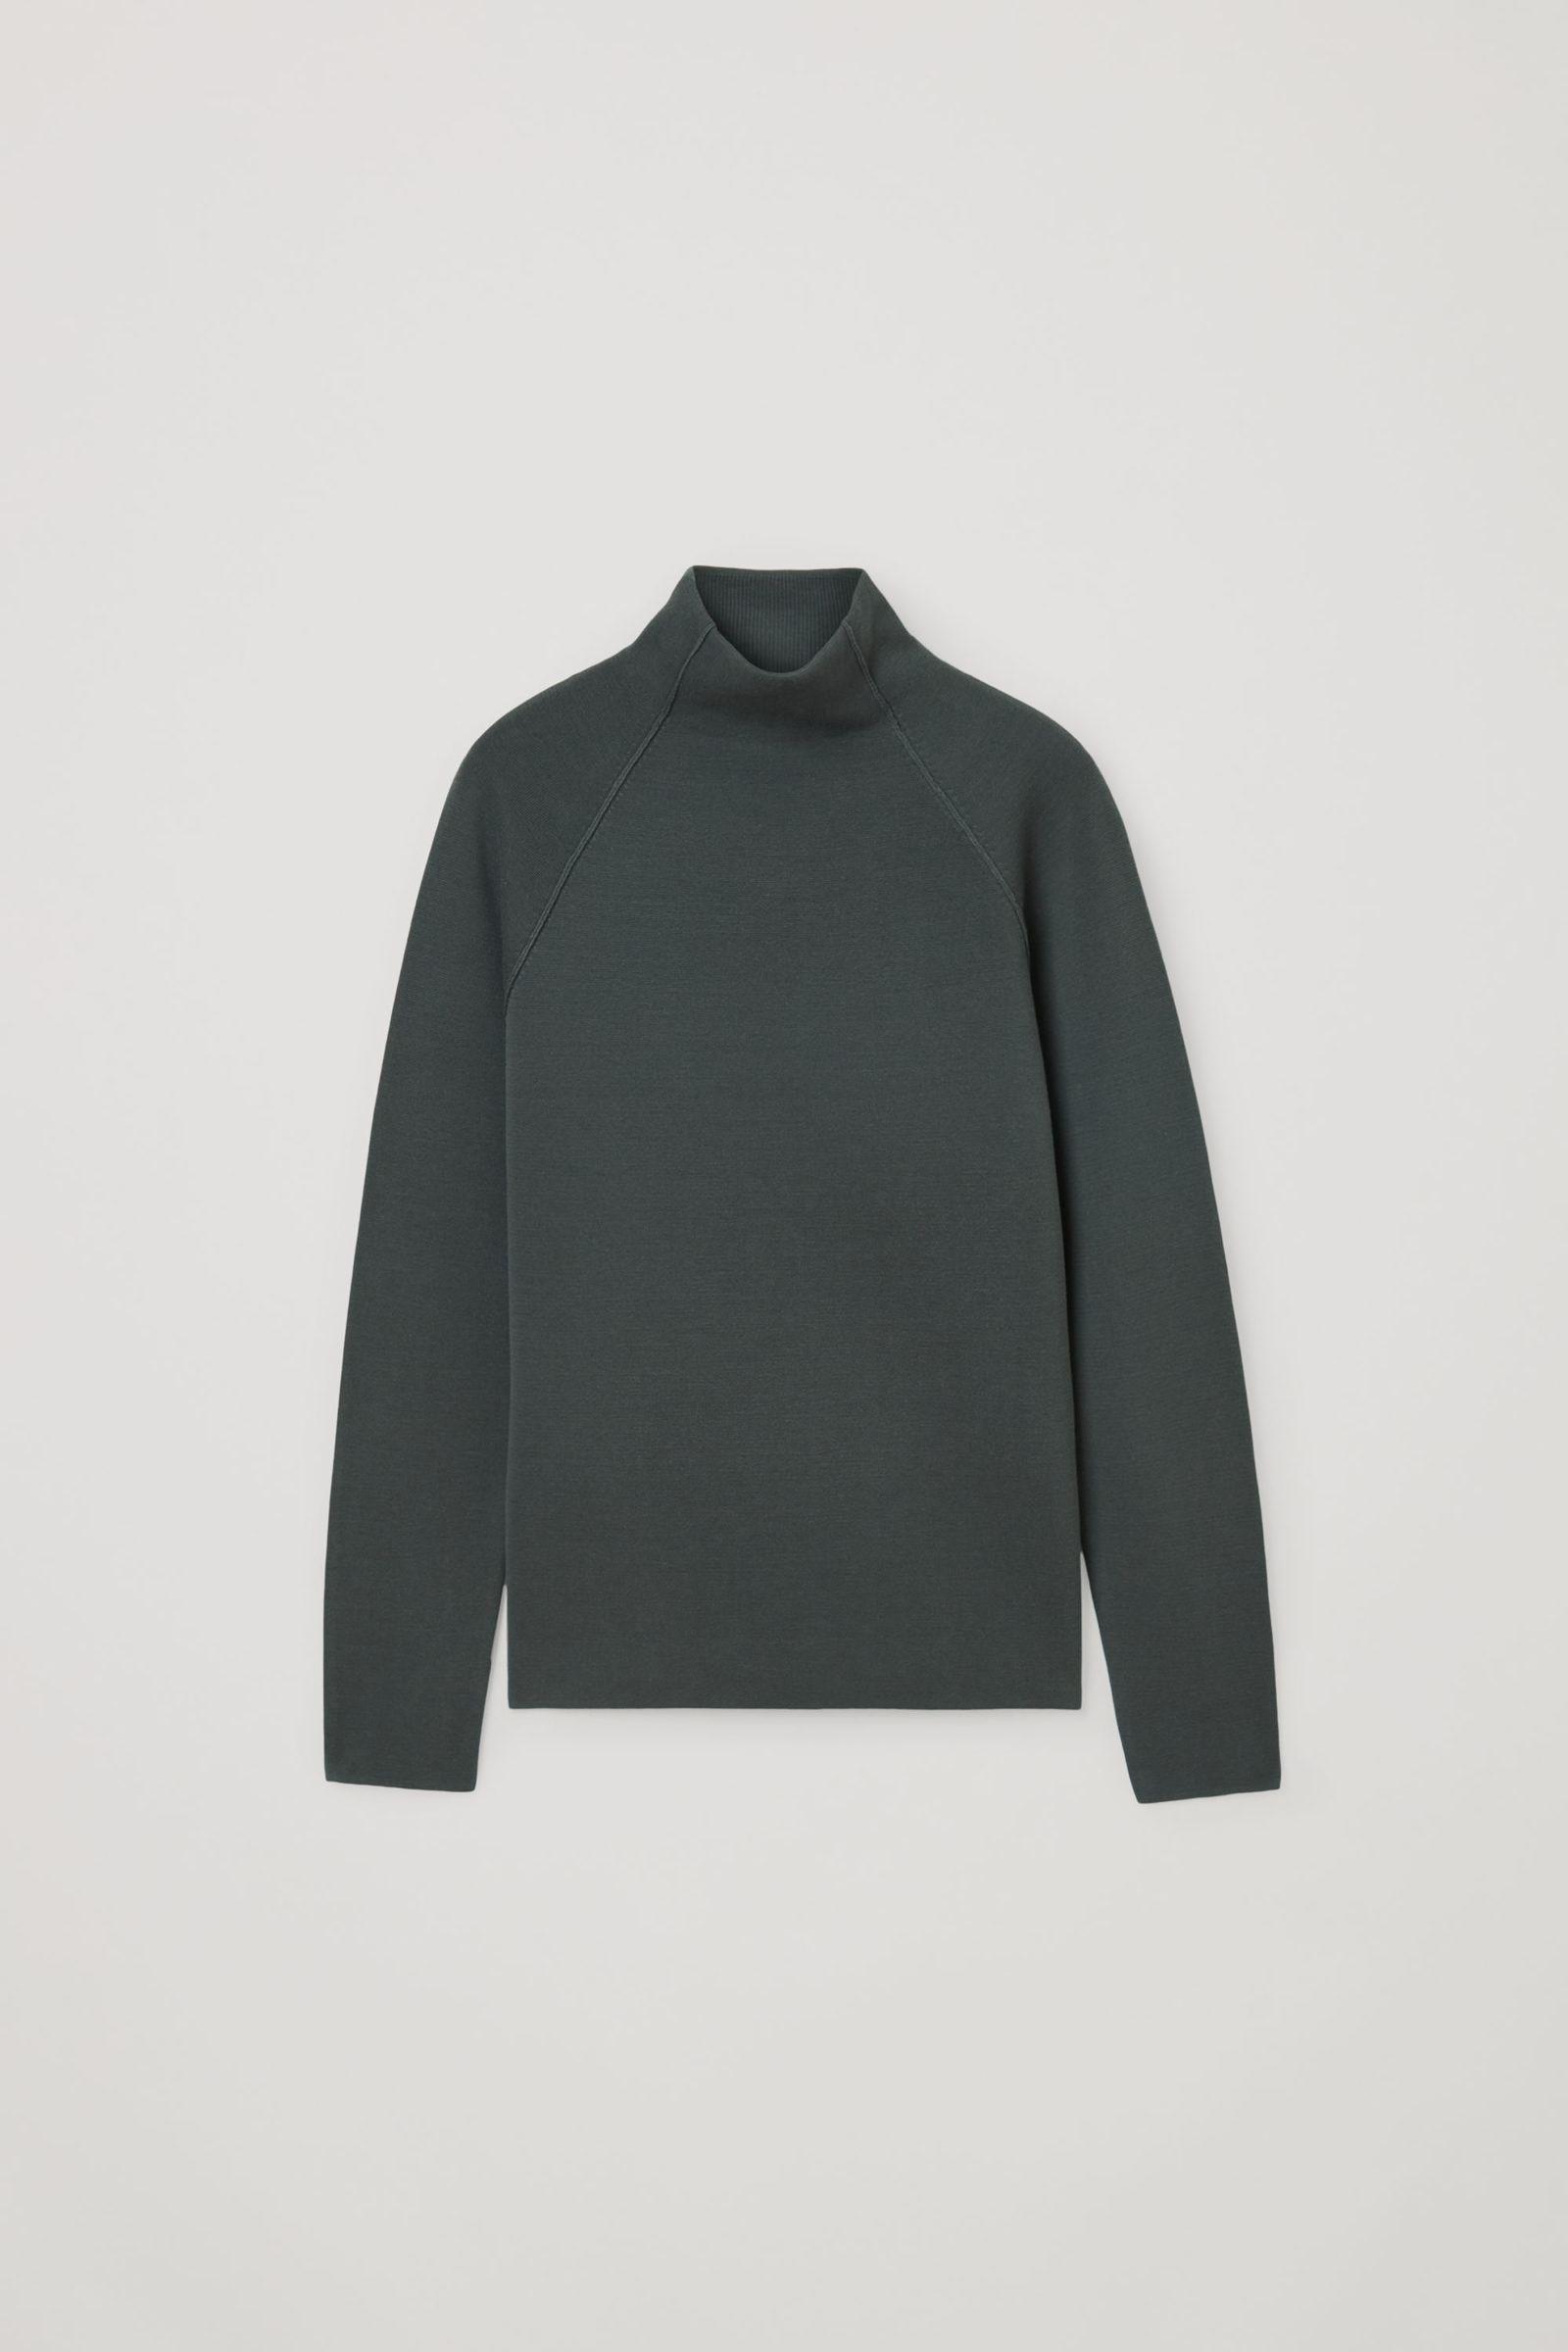 COS 폴로 넥 오가닉 코튼 스웨터의 그레이컬러 Product입니다.